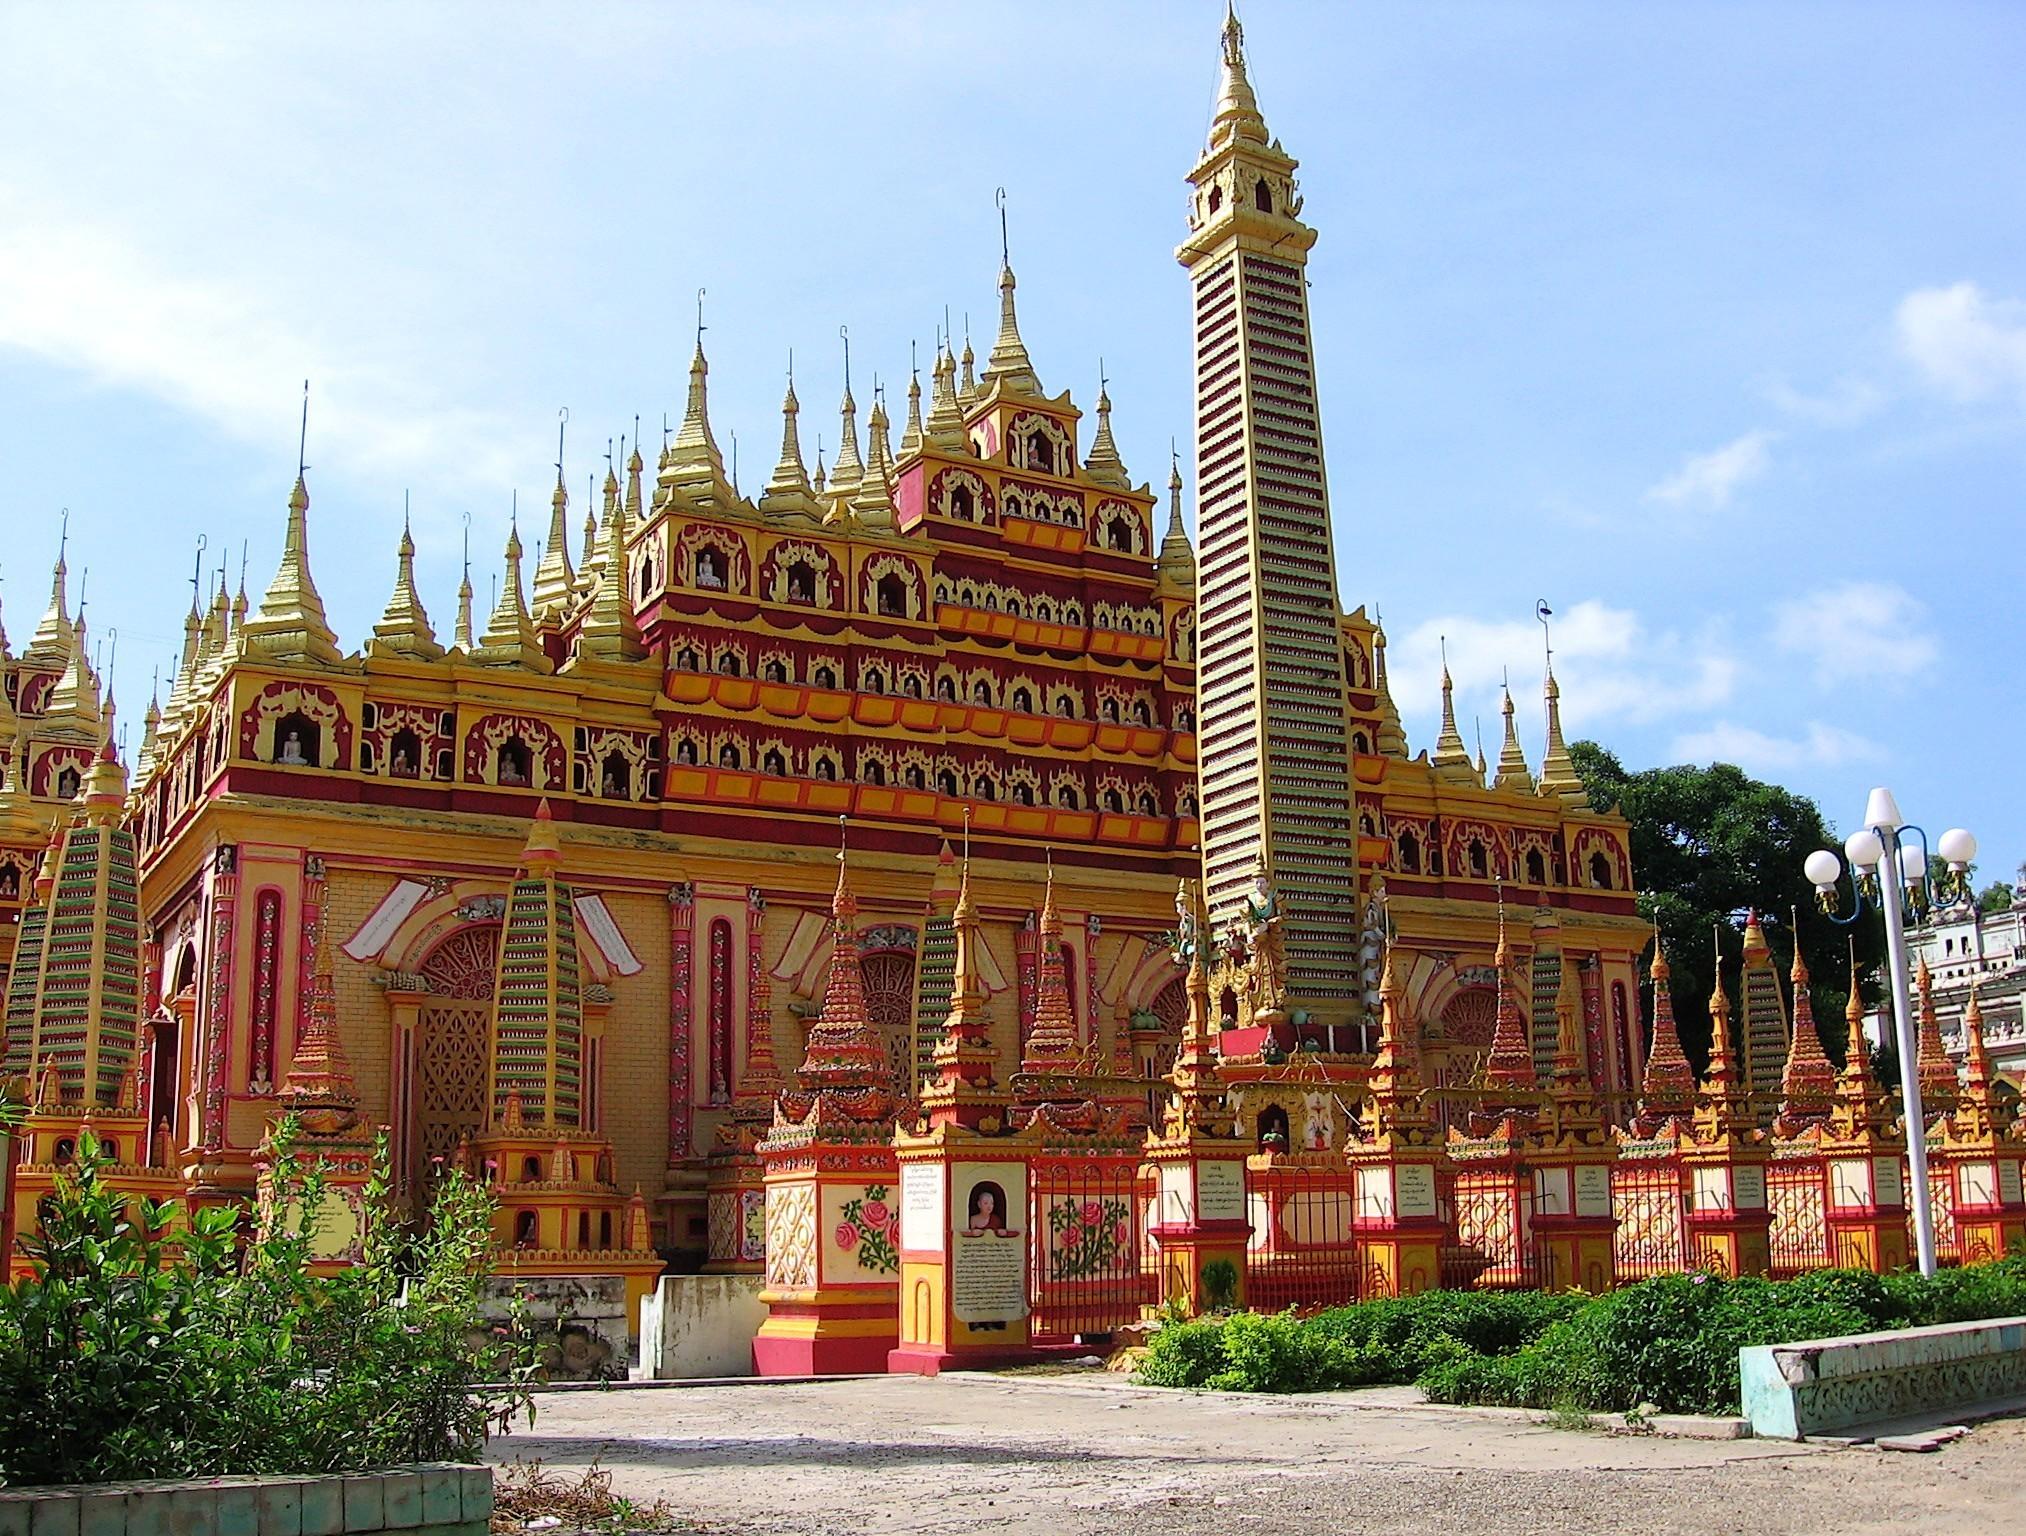 Monywa Myanmar  city photos gallery : Monywa thanboddhay d13 Wikipedia, the free encyclopedia